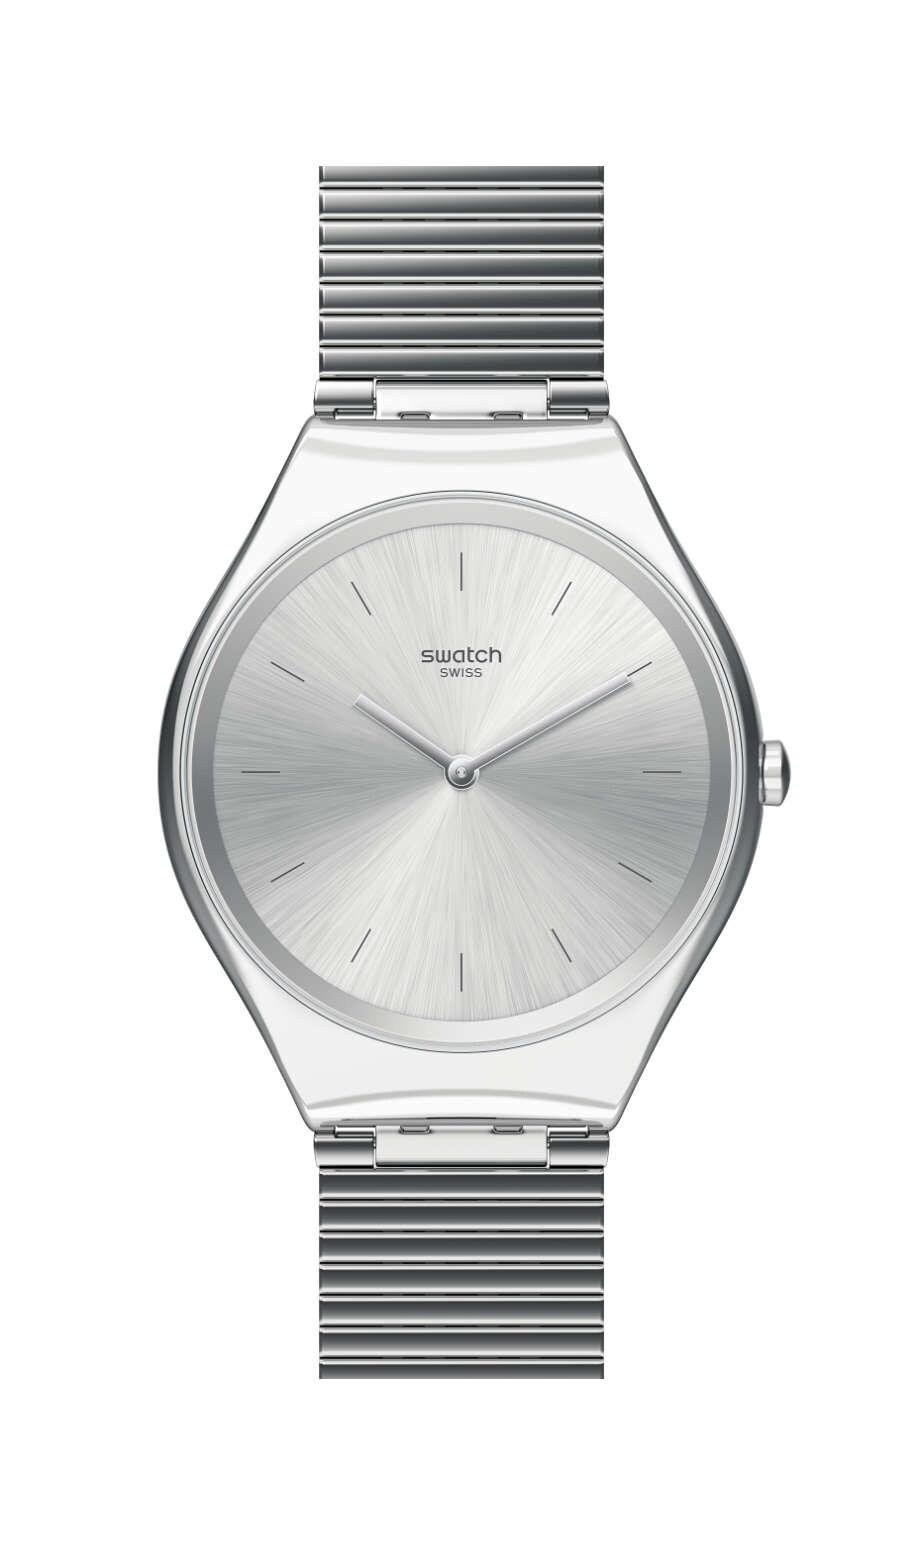 Swatch - SKINPOLE - 1